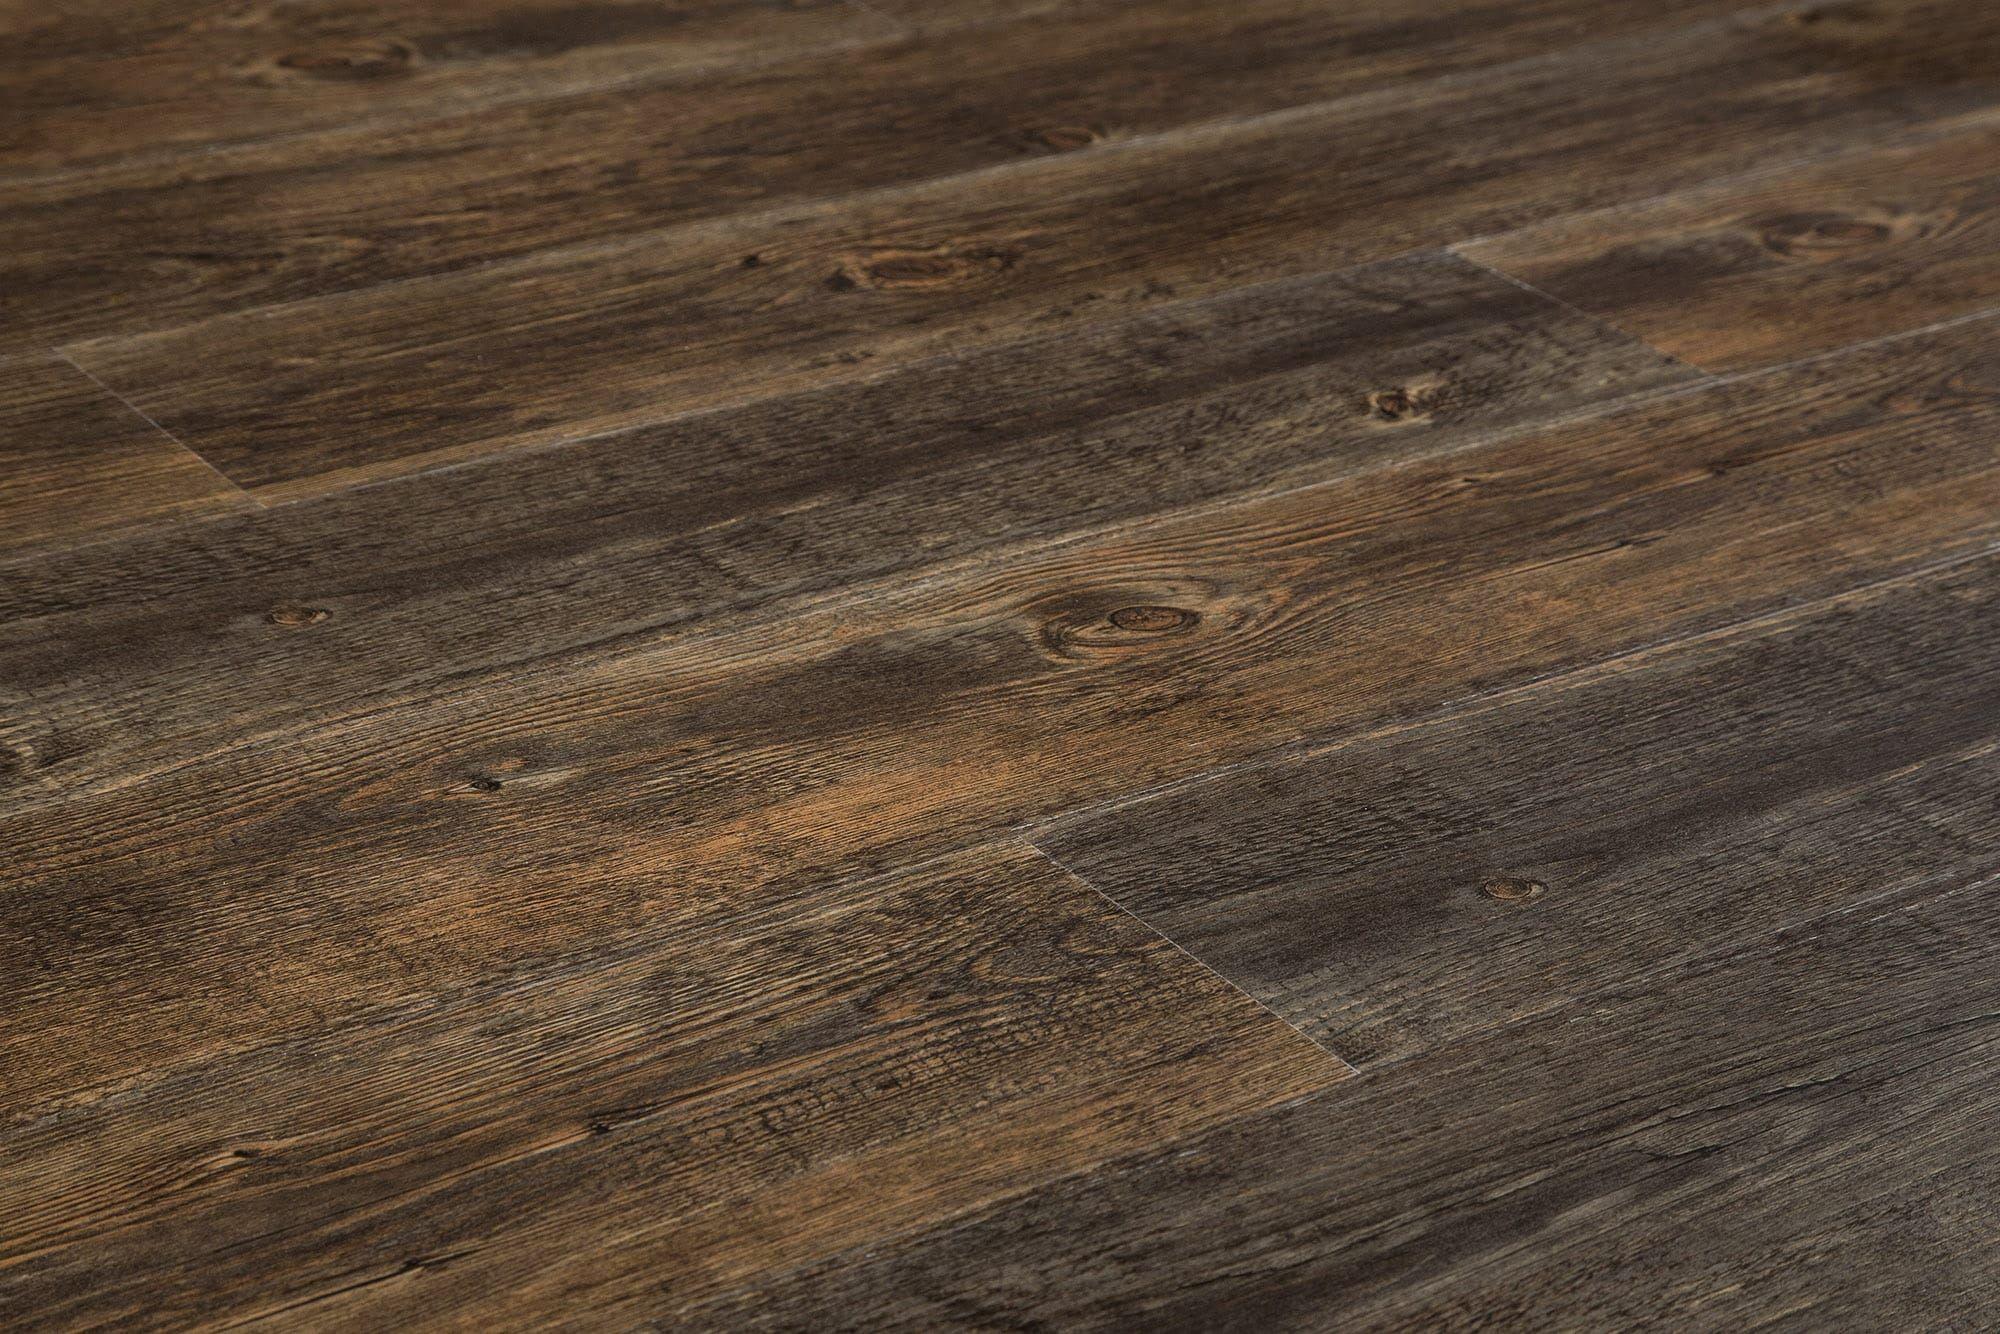 Builddirect Vesdura Vinyl Planks 4mm Pvc Click Lock Traditions Collection Vinyl Plank Builddirect Vinyl Plank Flooring